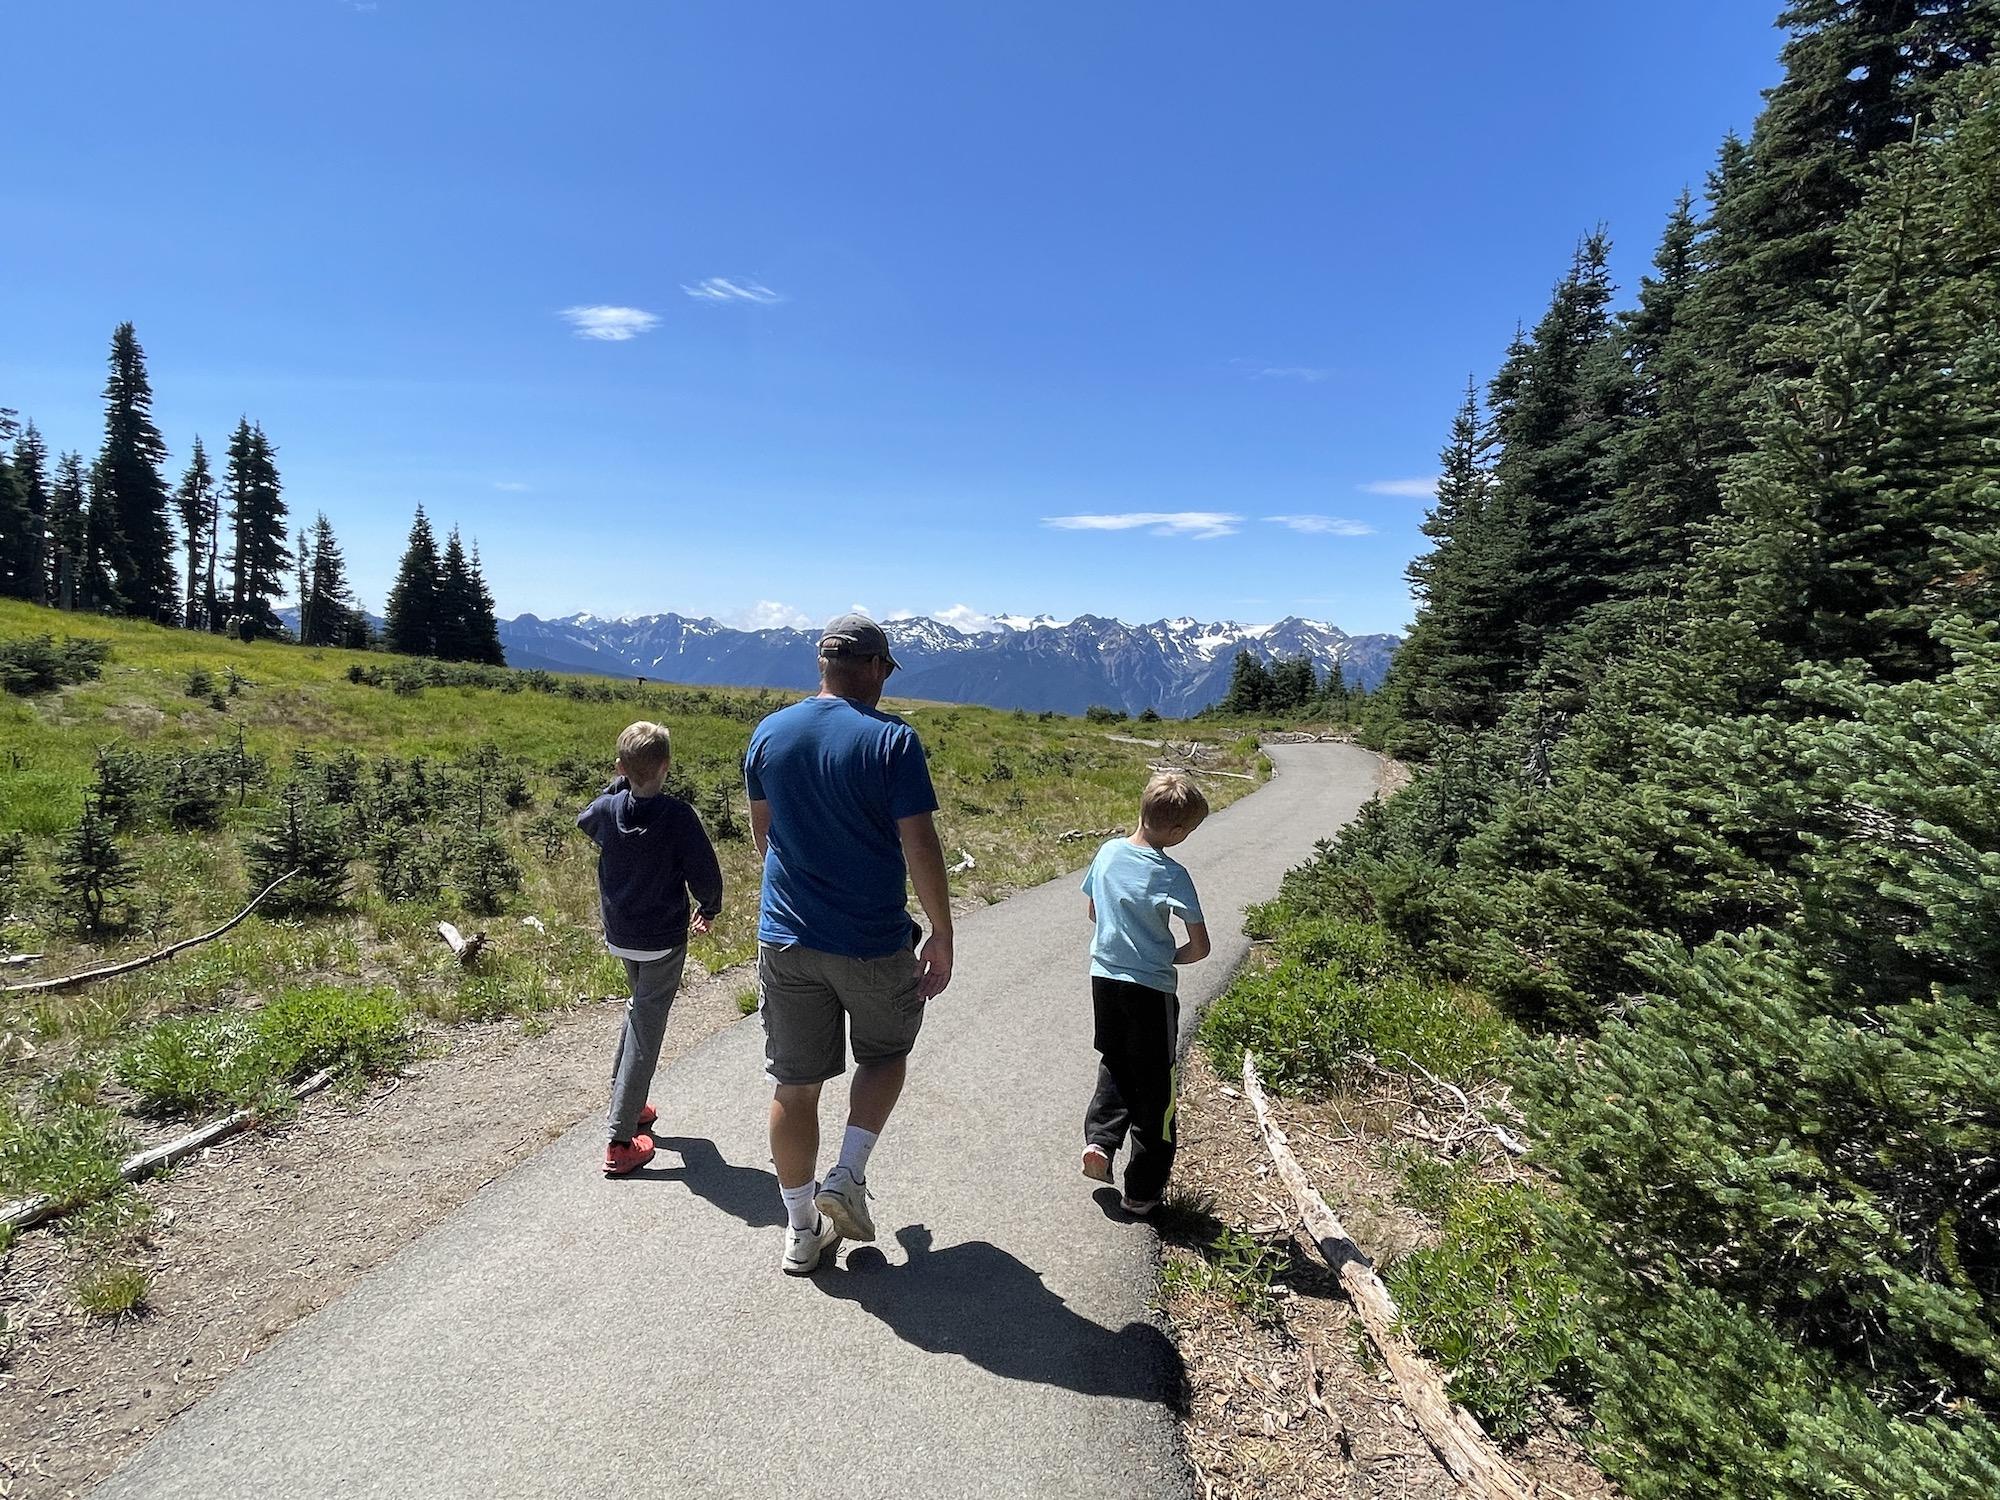 Cirque Rim Trail Olympic National Park